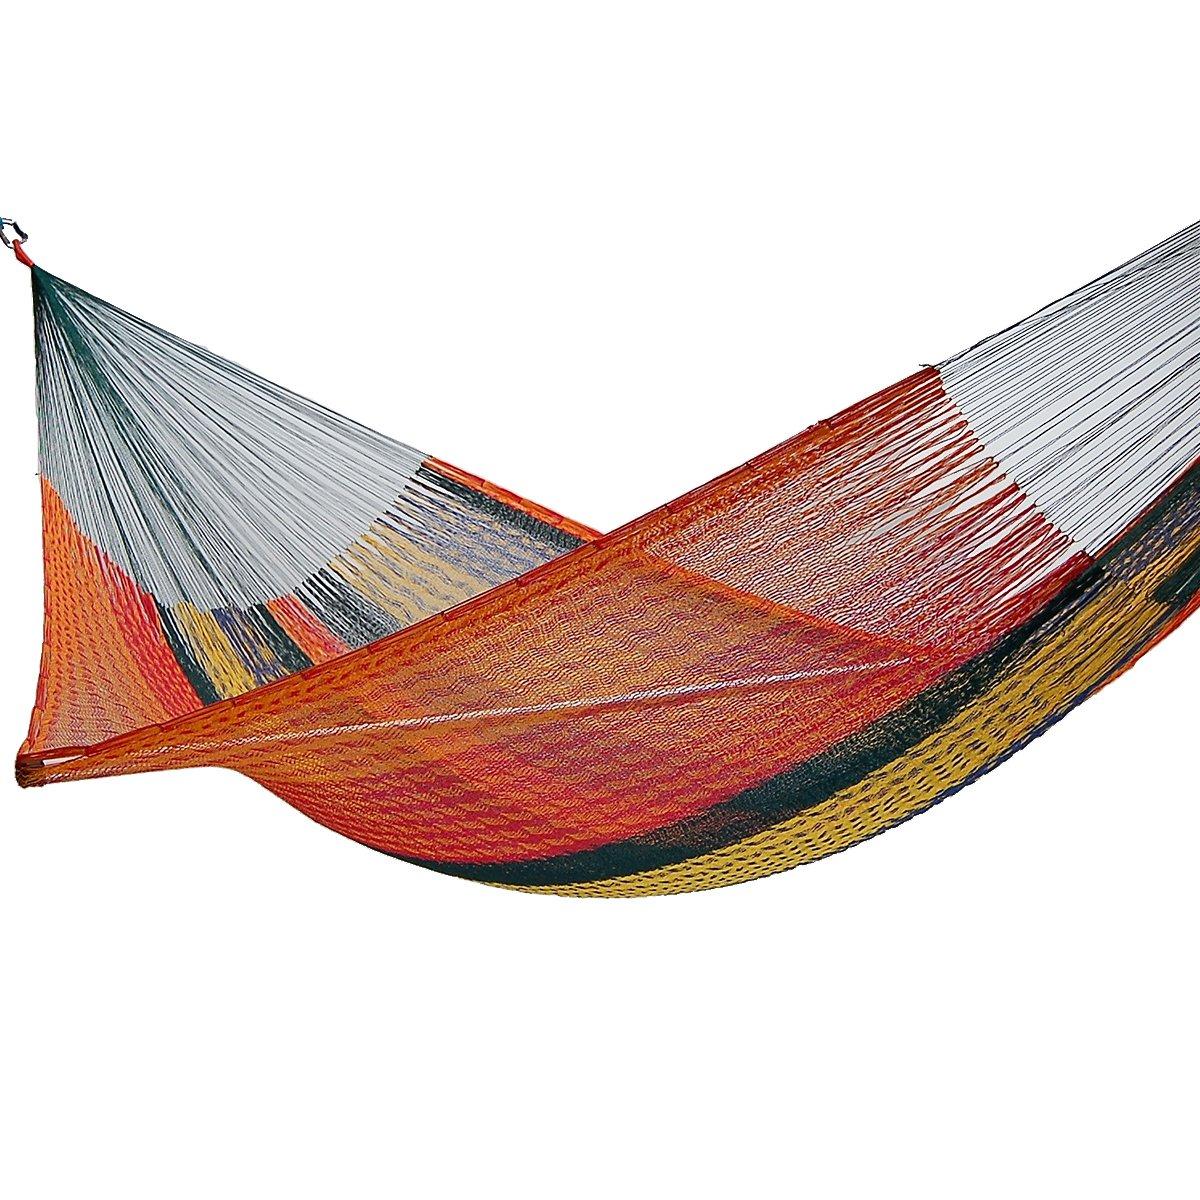 HAMACAS RADA(ハマカス ラダ) マヤンハンモックL 426071-L7 B0754XD8JH